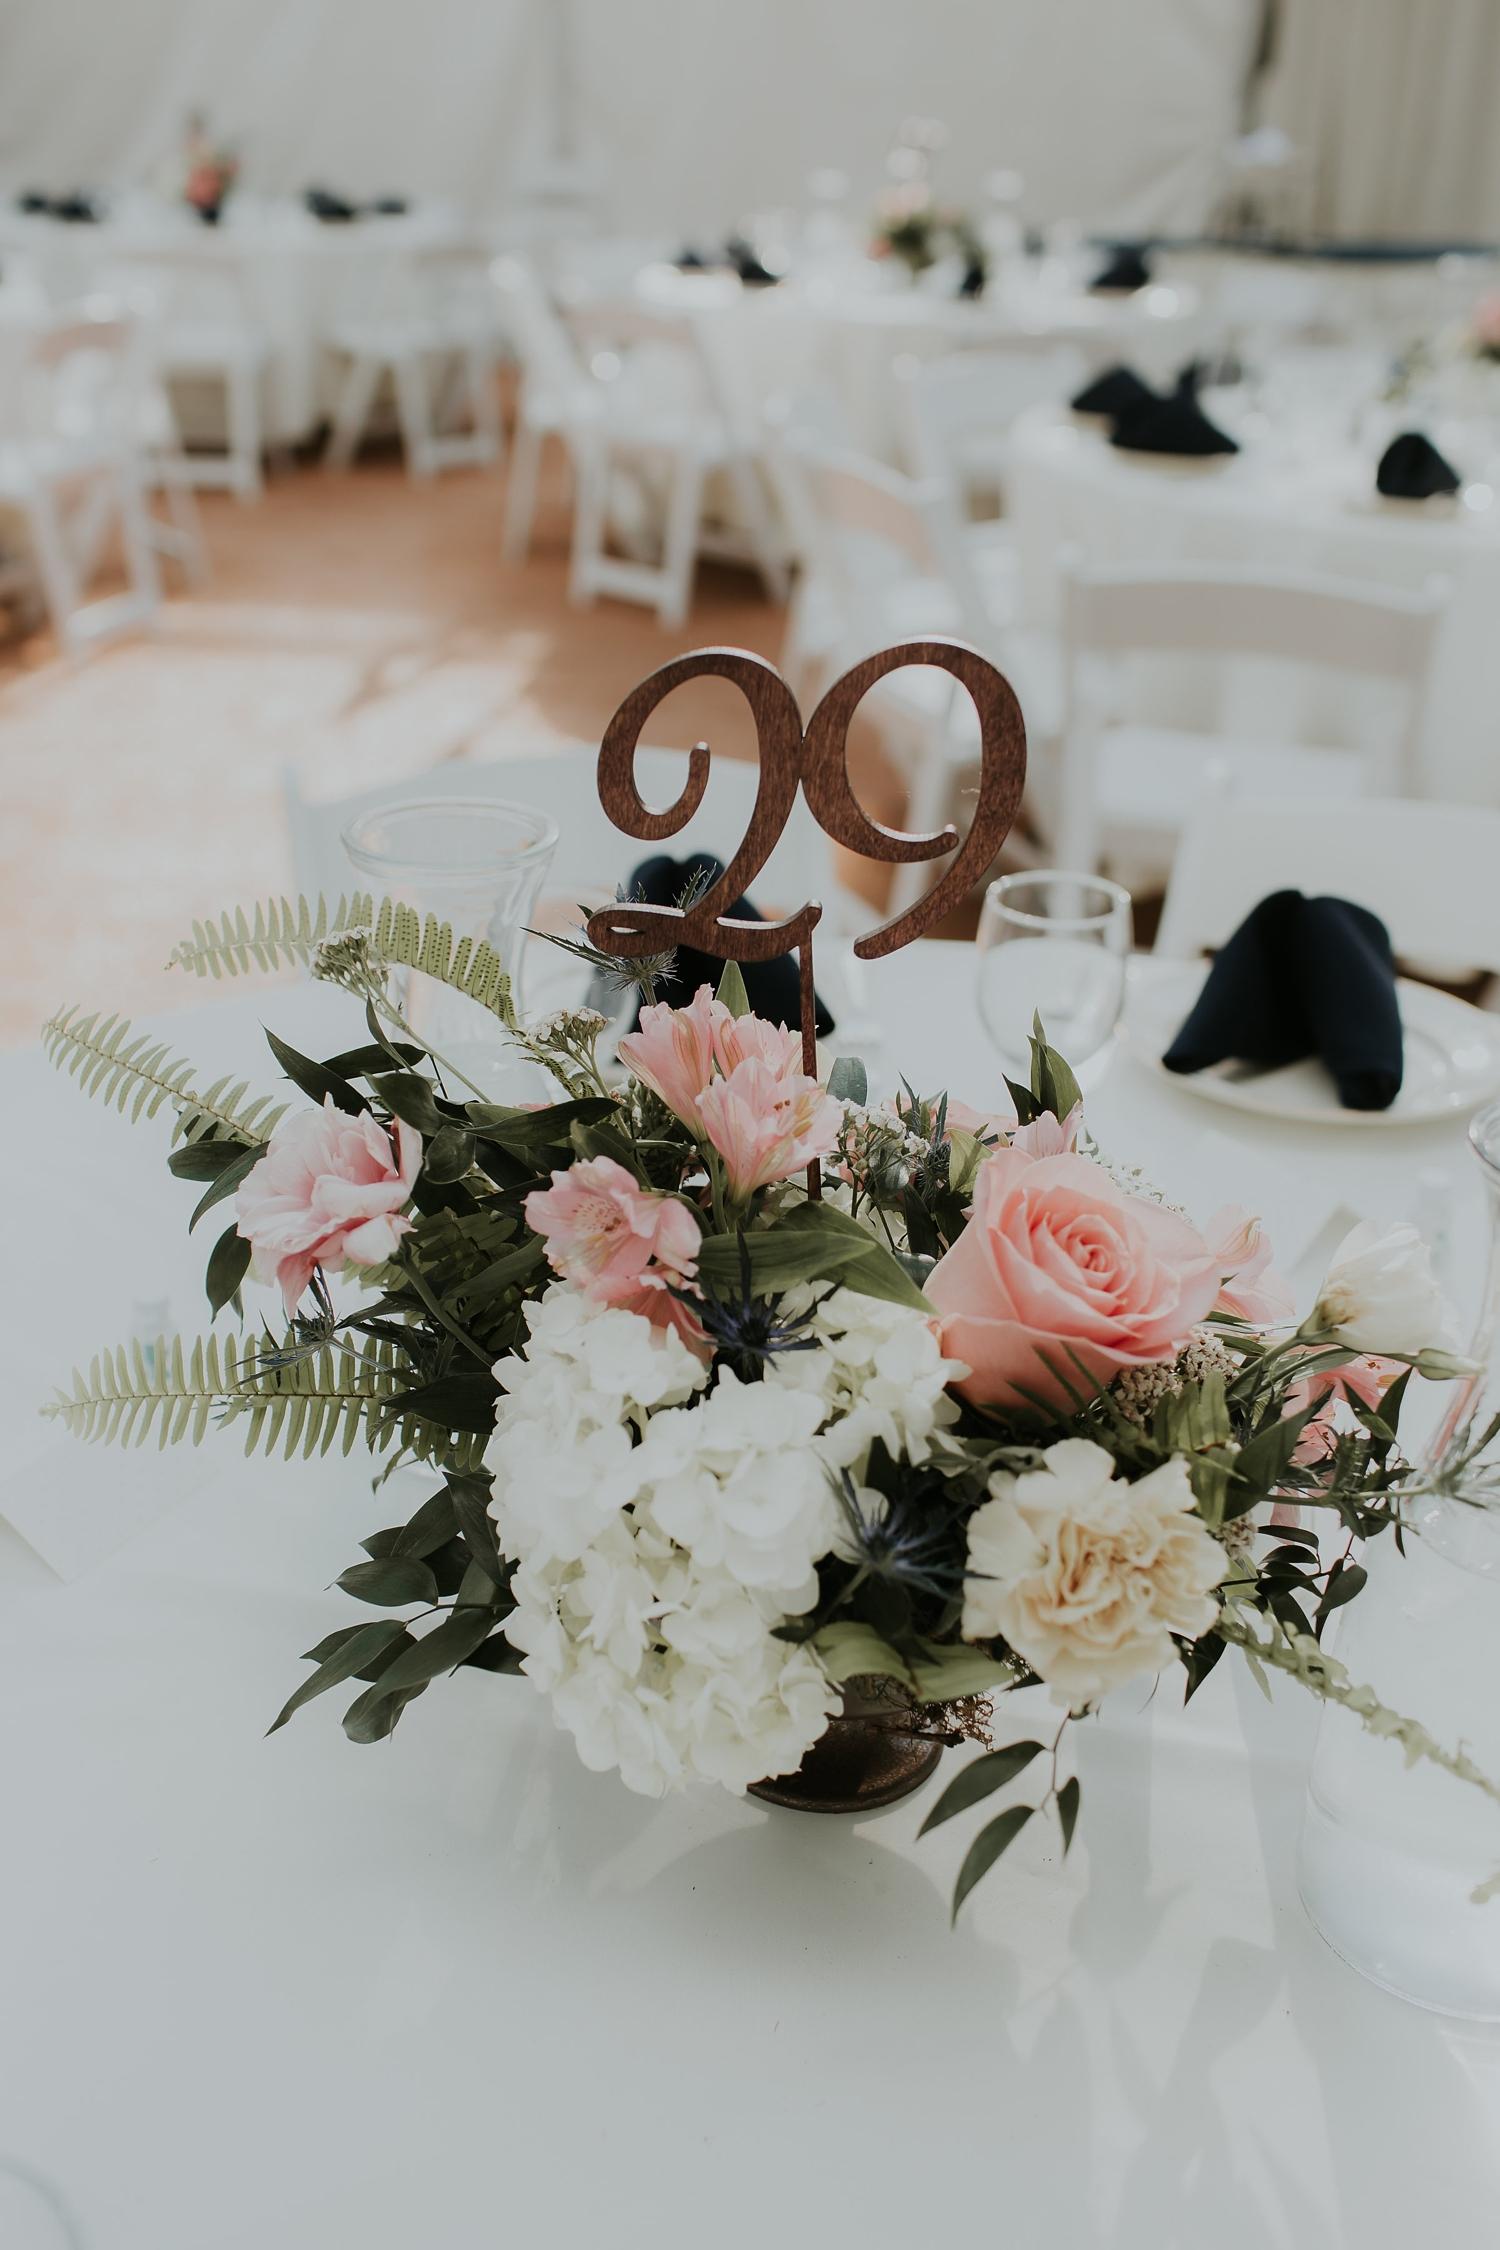 Alicia+lucia+photography+-+albuquerque+wedding+photographer+-+santa+fe+wedding+photography+-+new+mexico+wedding+photographer+-+wedding+flowers+-+summer+wedding+flowers_0032.jpg